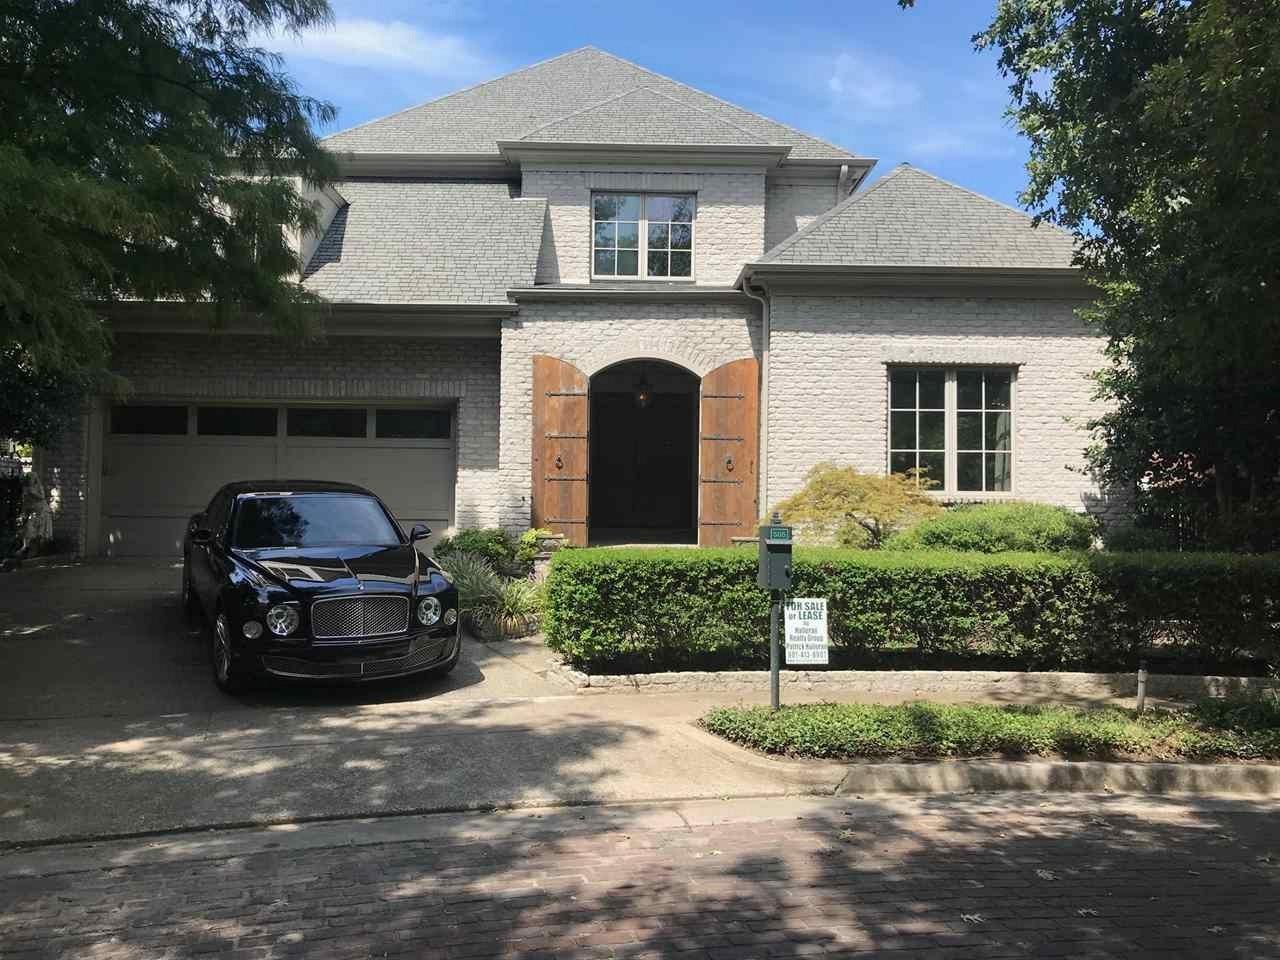 505 Monteigne Memphis, TN 38103 - MLS #: 9995243